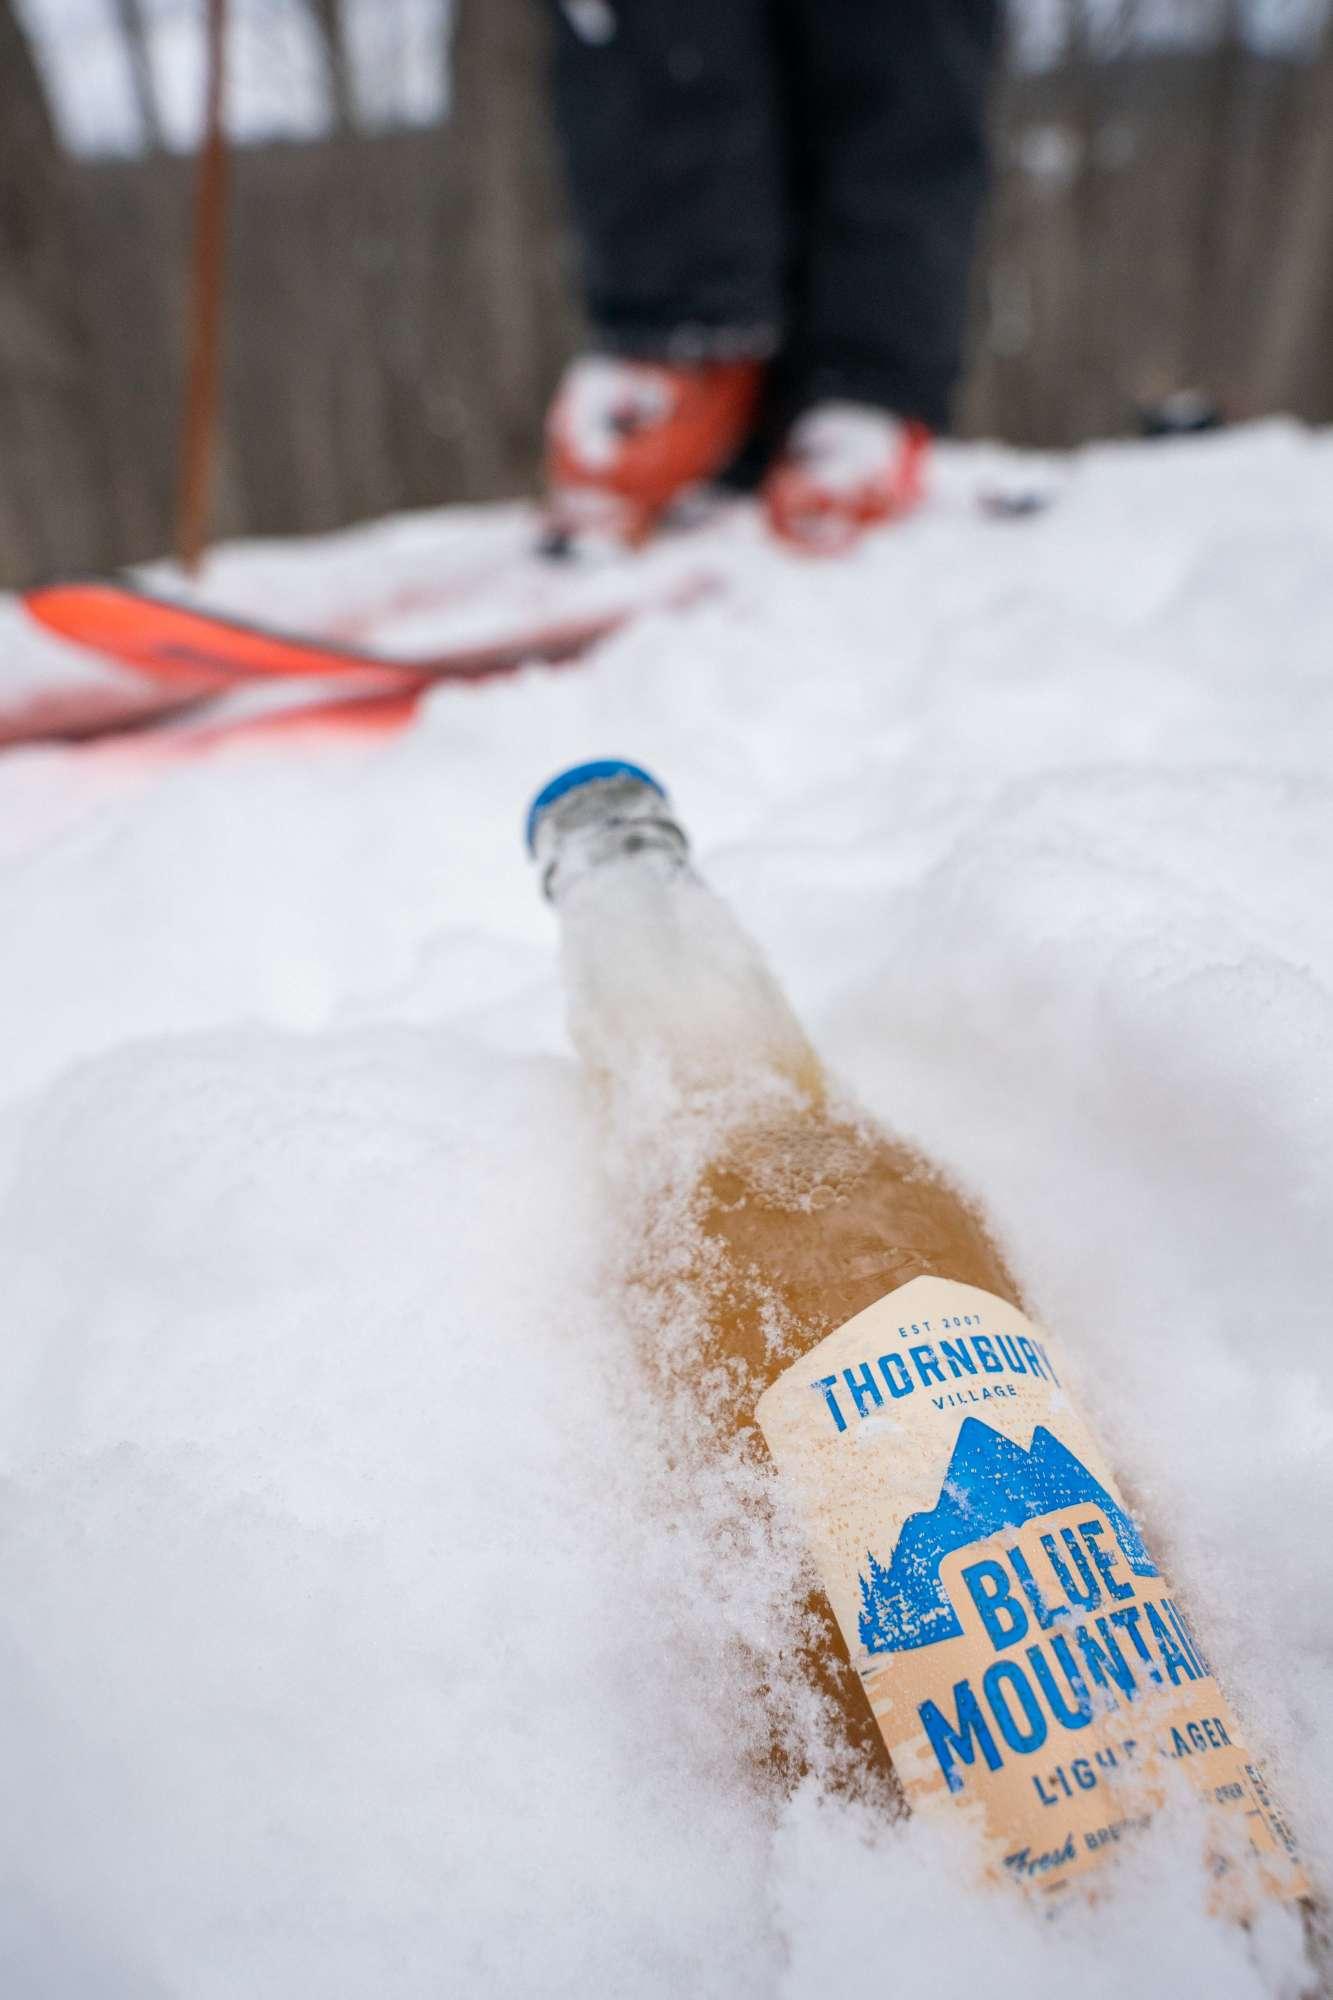 Thornbury Beer